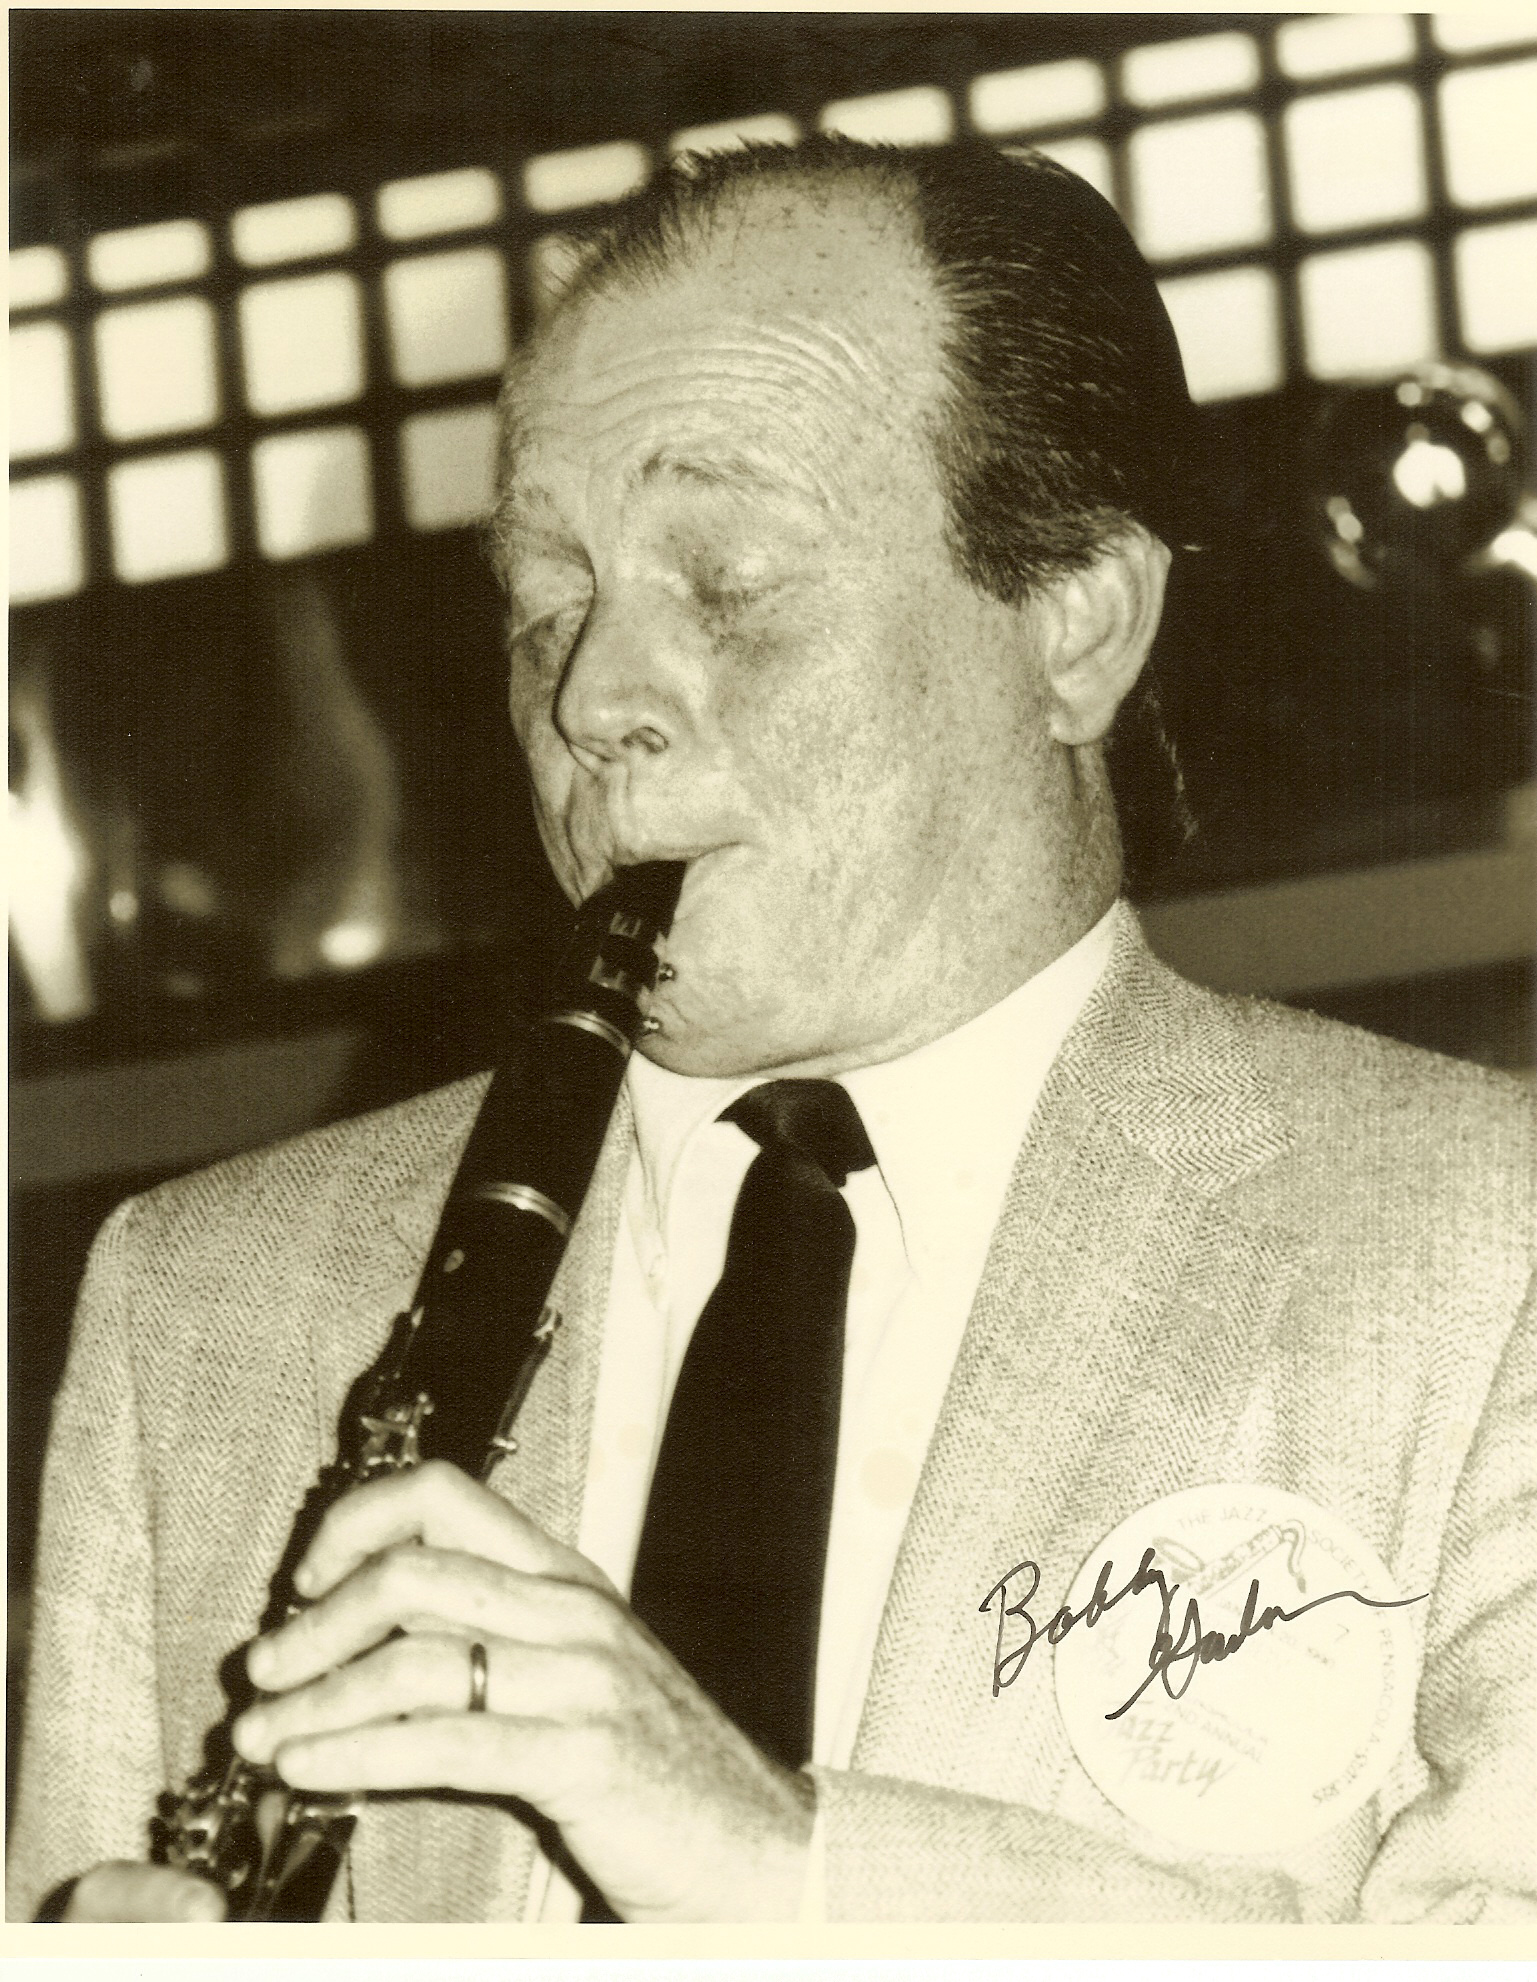 BOBBY GORDON (CLARINET) picture